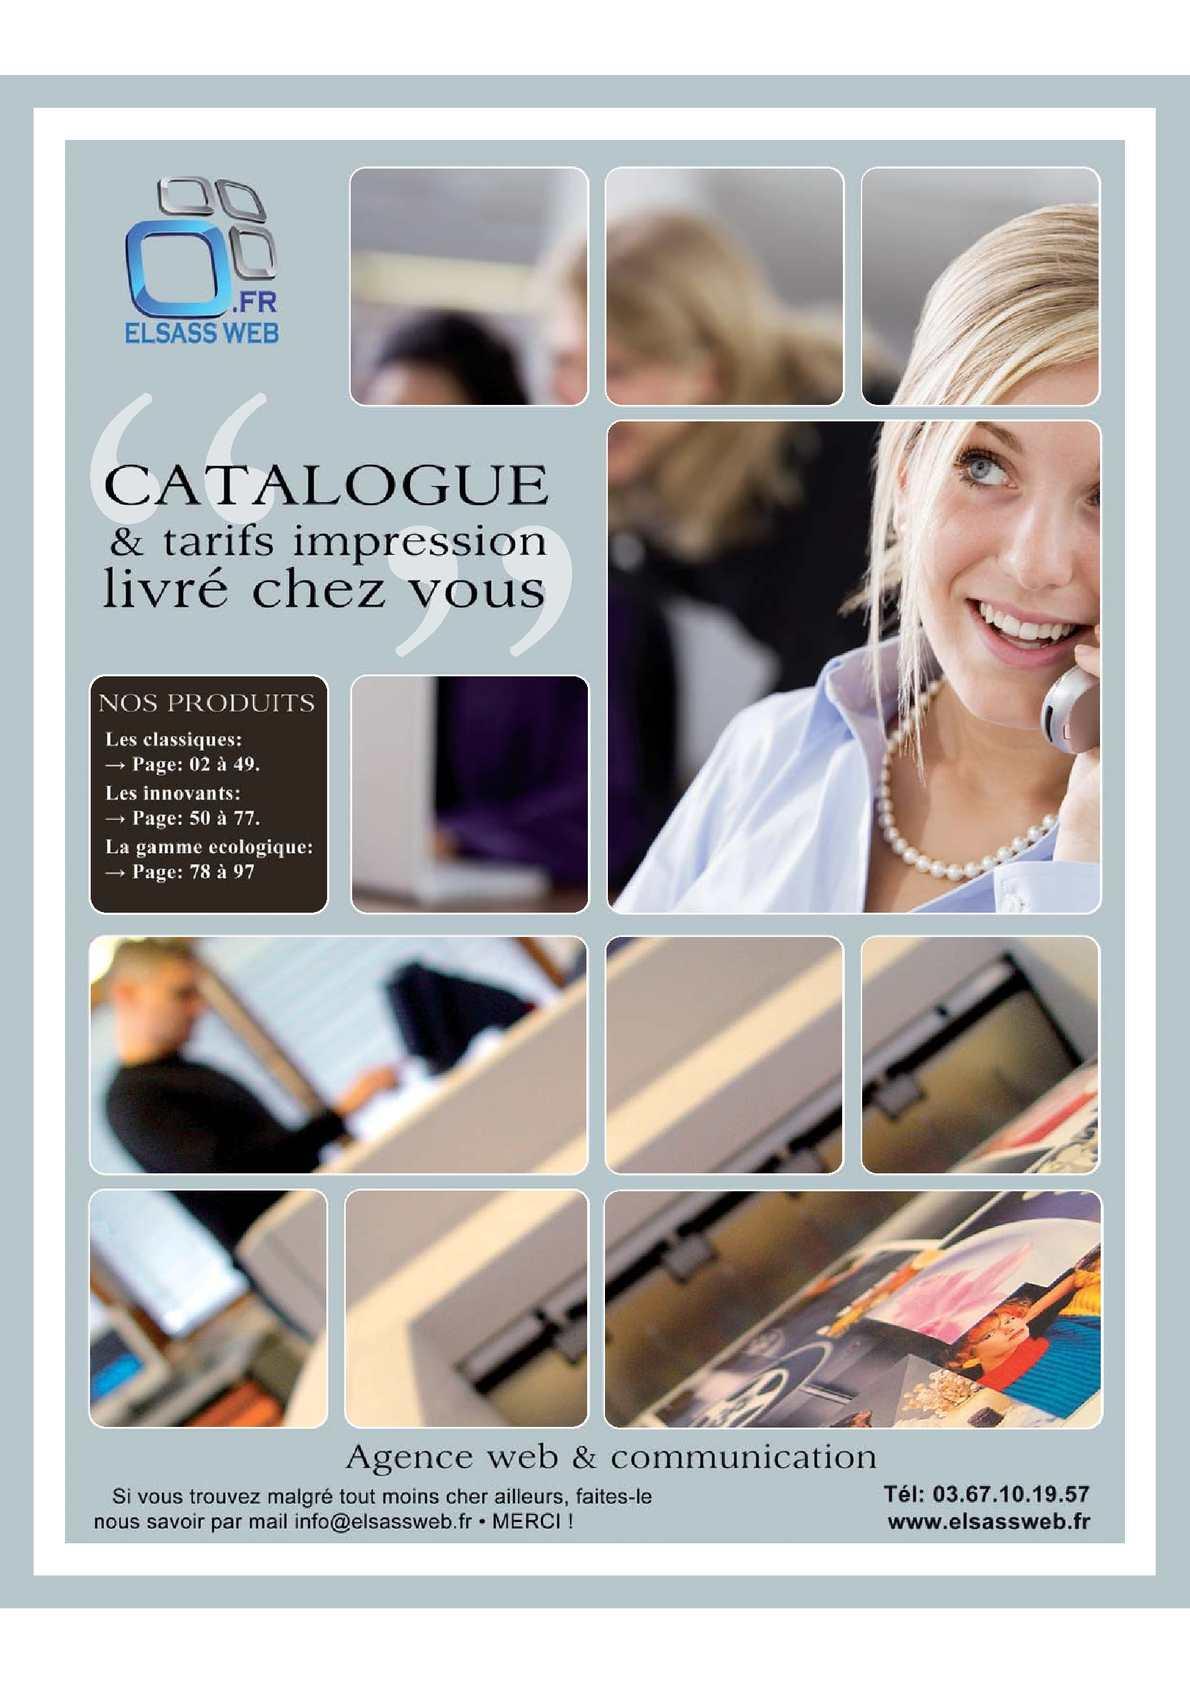 Elsass Web catalogue & tarifs impression - Agence web & communication